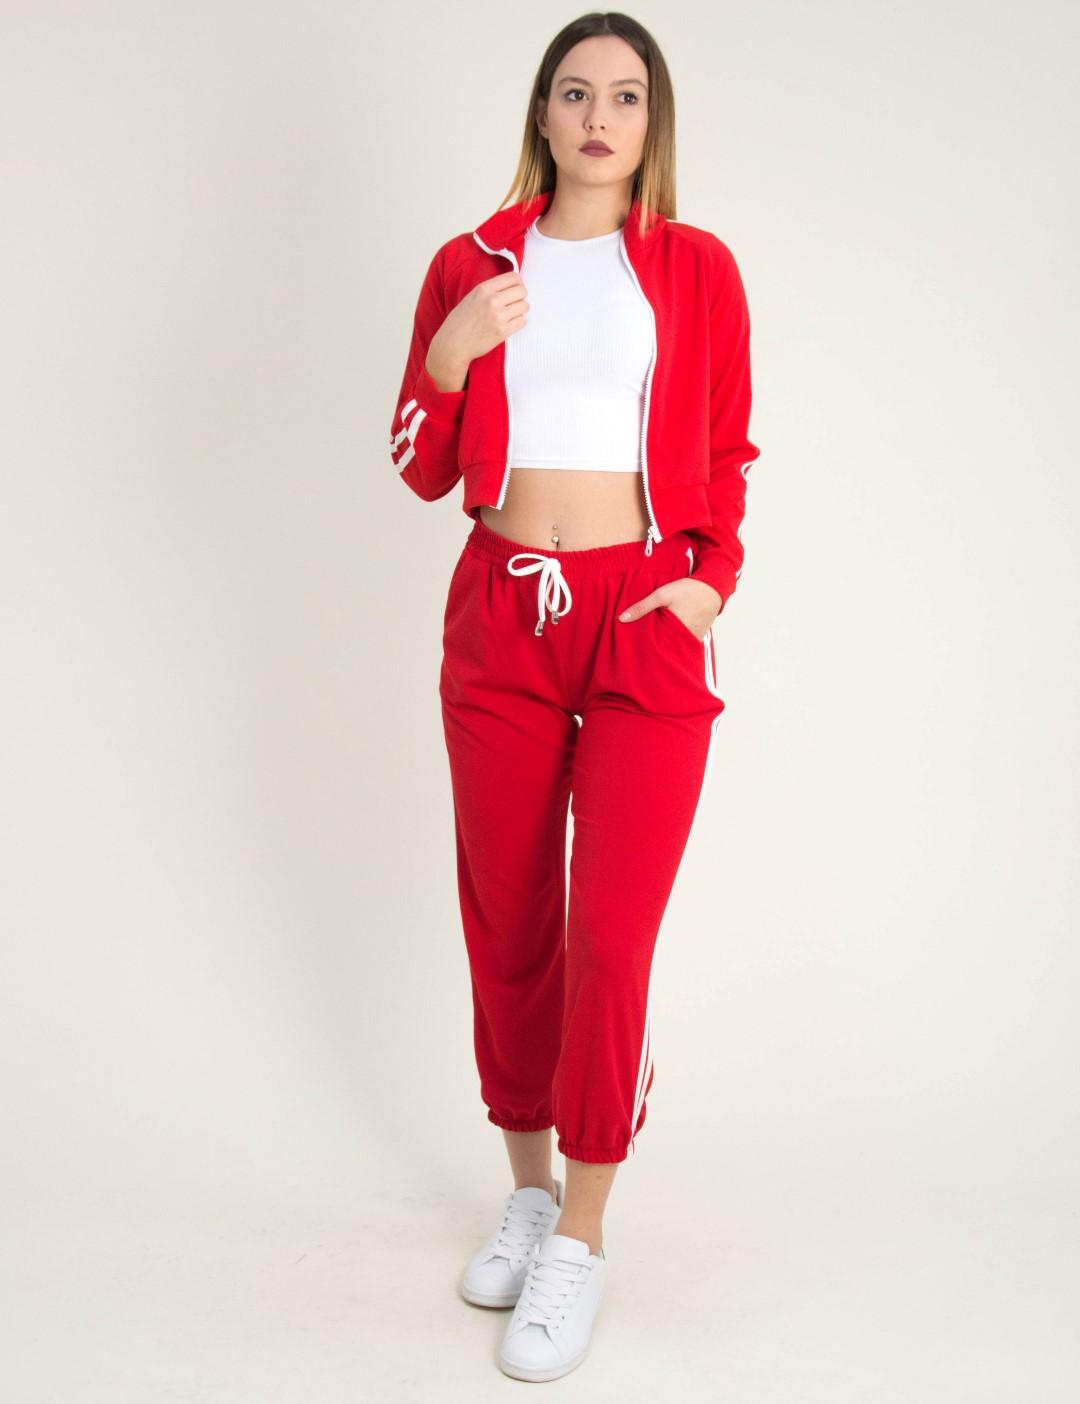 ea0d75abe9e Γυναικείο κόκκινο παντελόνι λευκές ρίγες λάστιχο 201766E